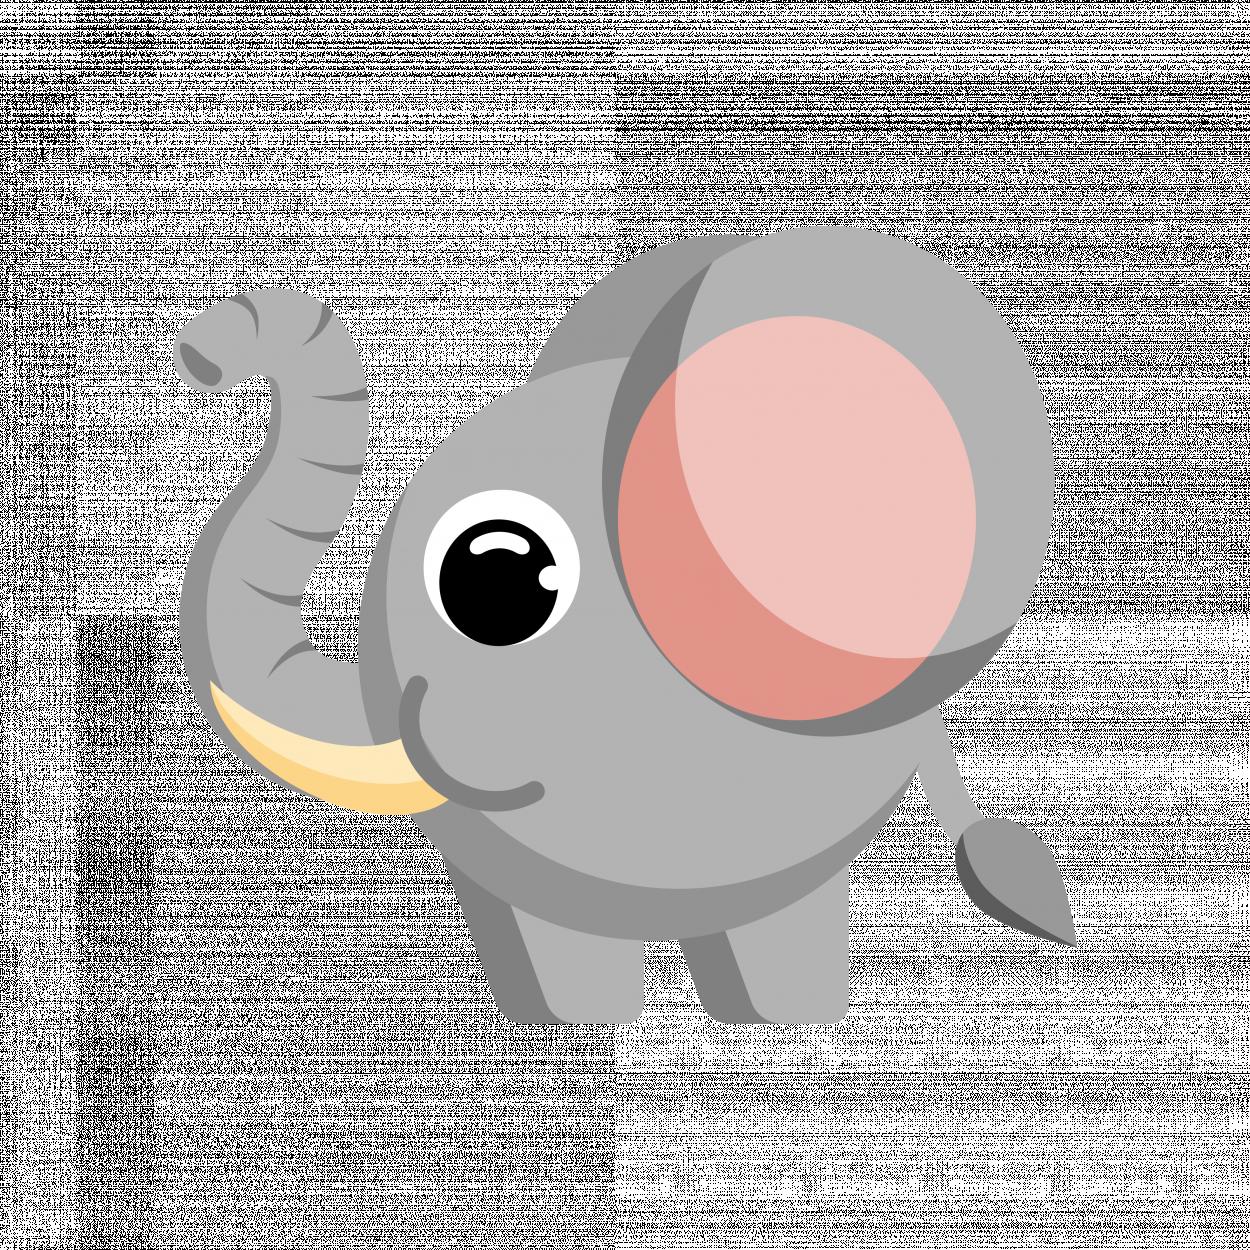 elephant-2.png